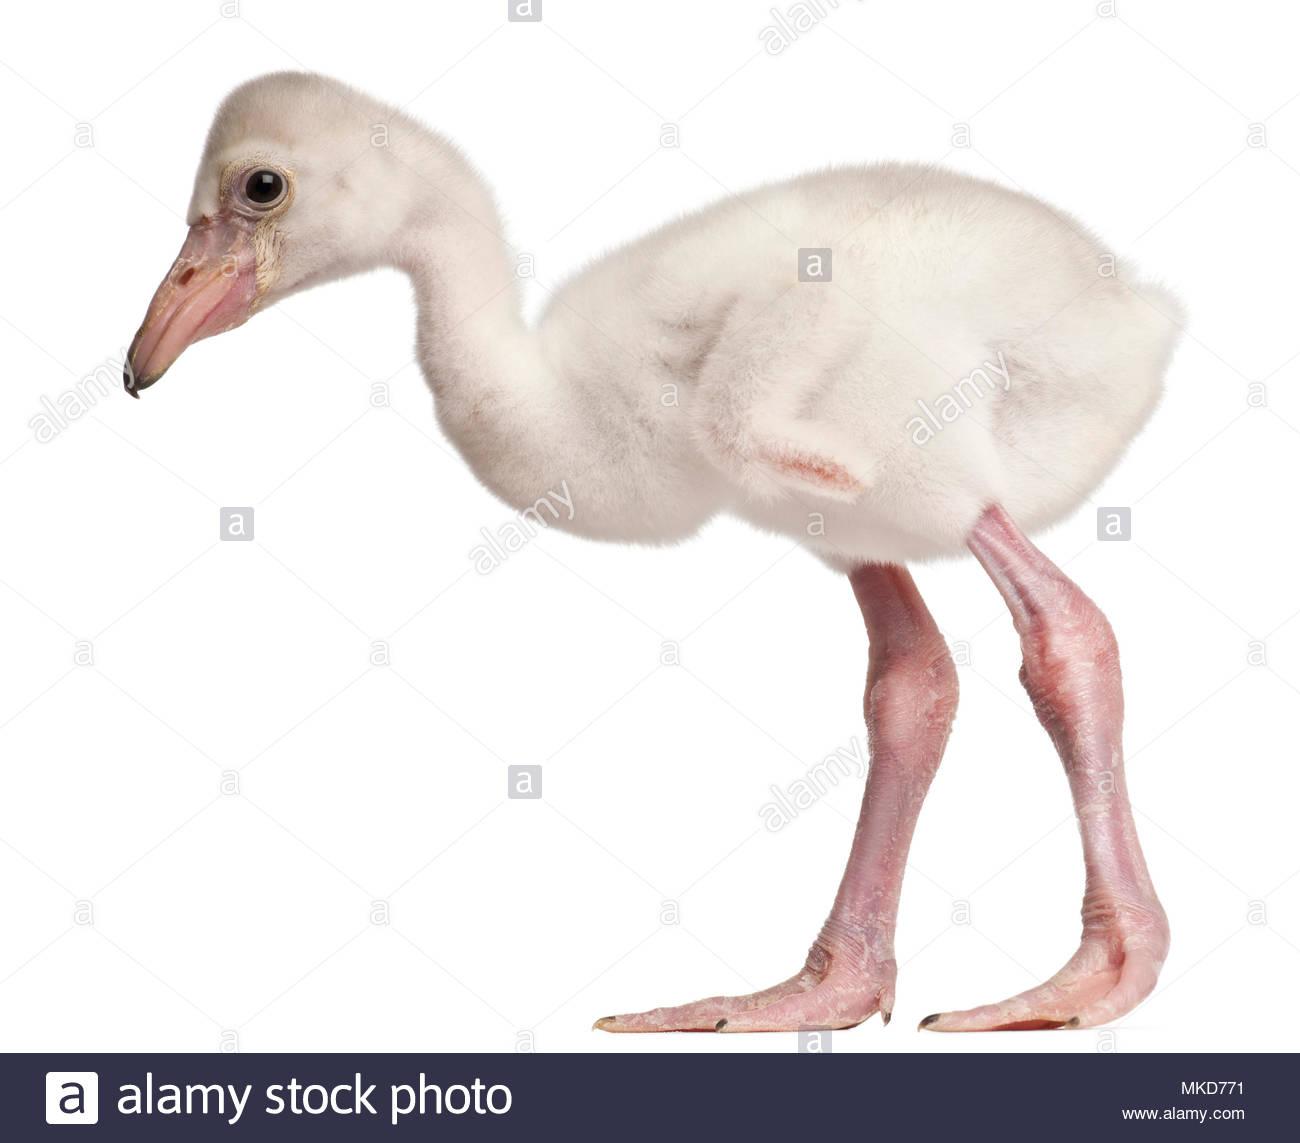 Greater Flamingo, (Phoenicopterus roseus), 14 days old, in front of white background, Mulhouse Zoological and Botanical Park, France - Stock Image